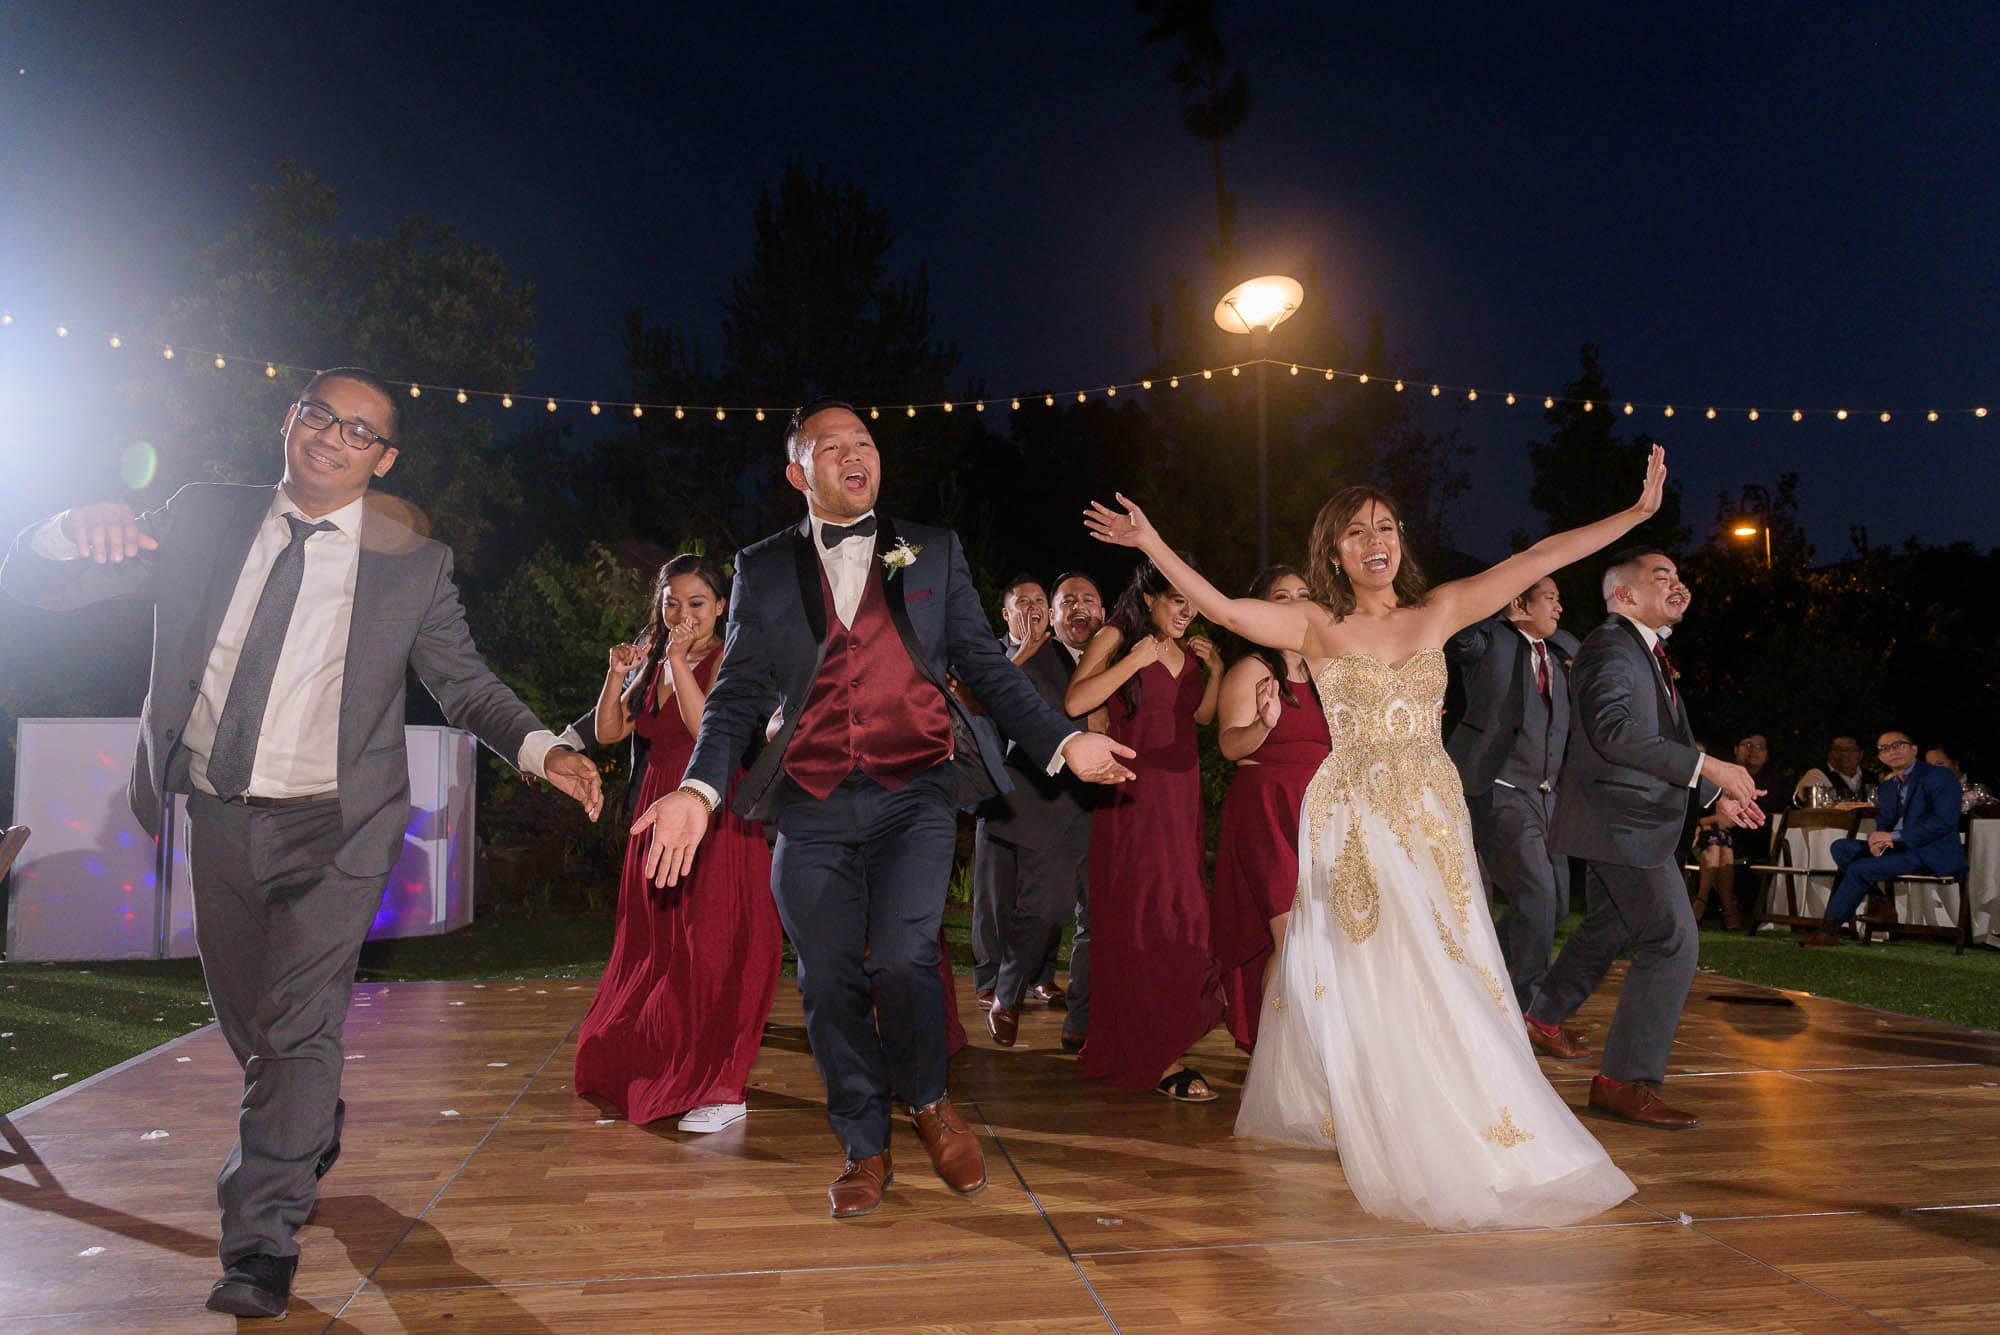 044_Alan_and_Heidi_Wedding_Karla_Paolo